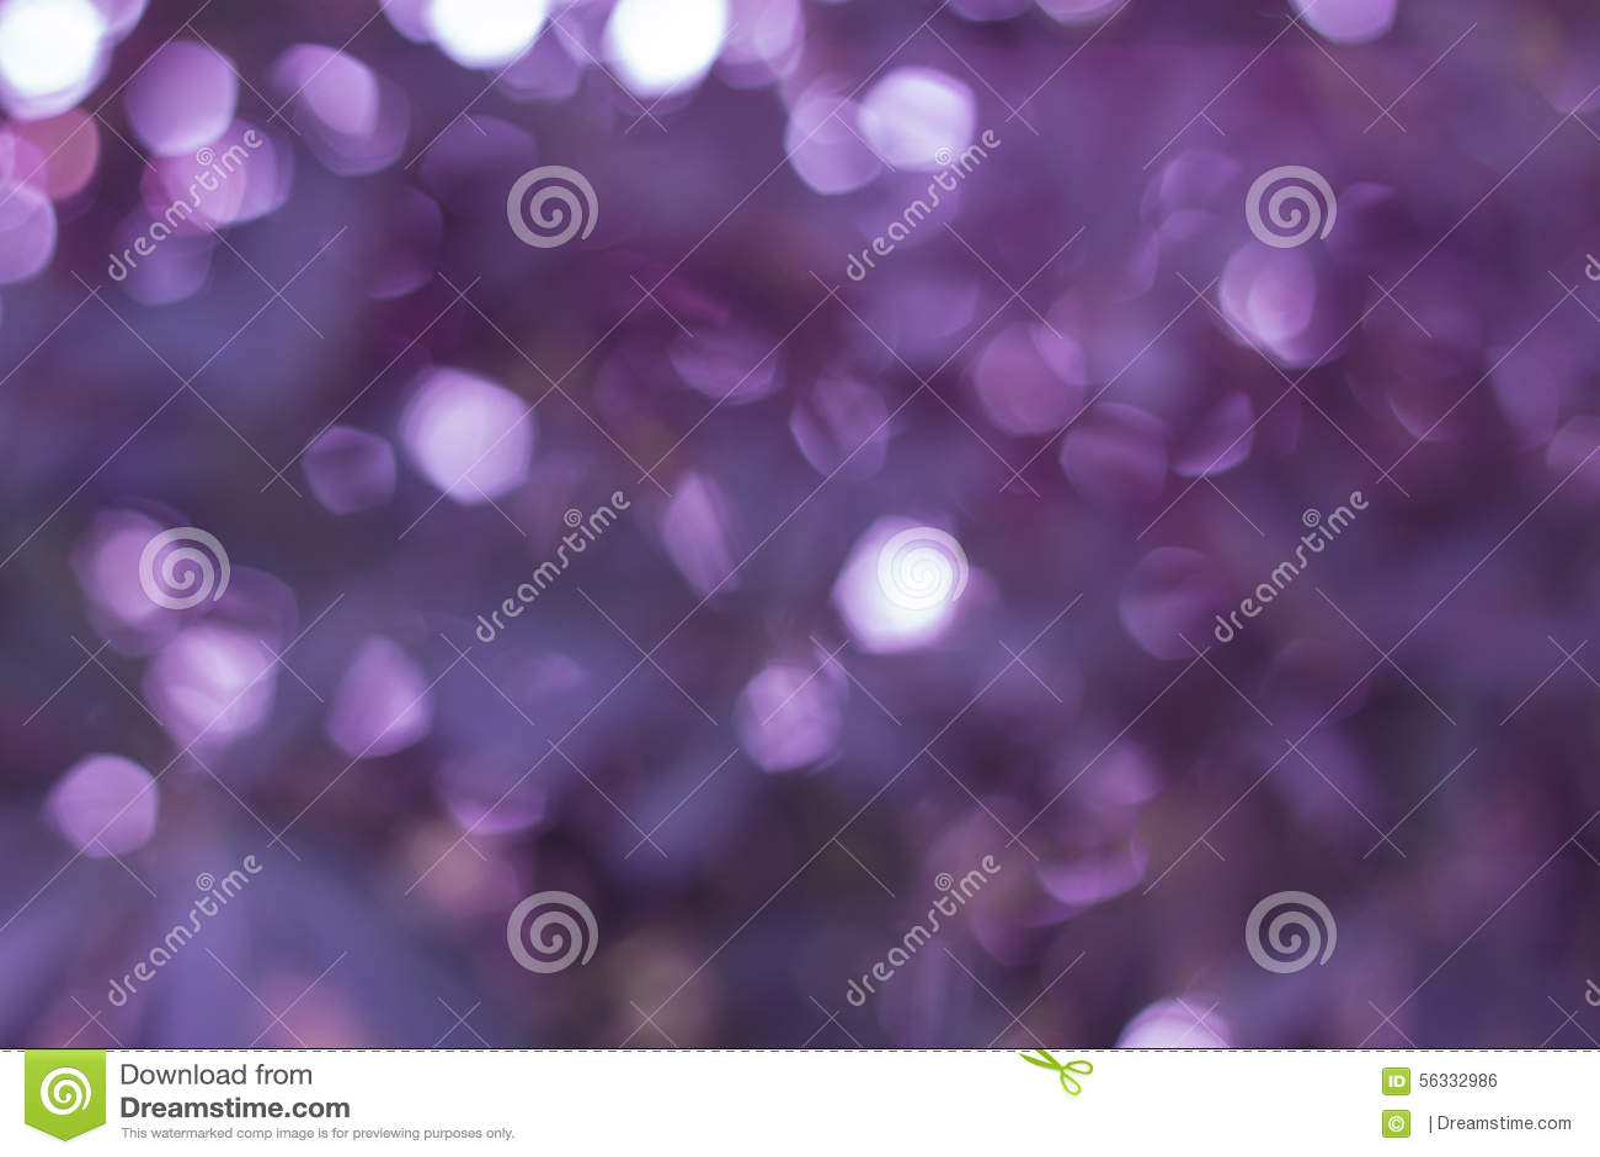 Violet bokeh abstract light backgrounds,blurred lights